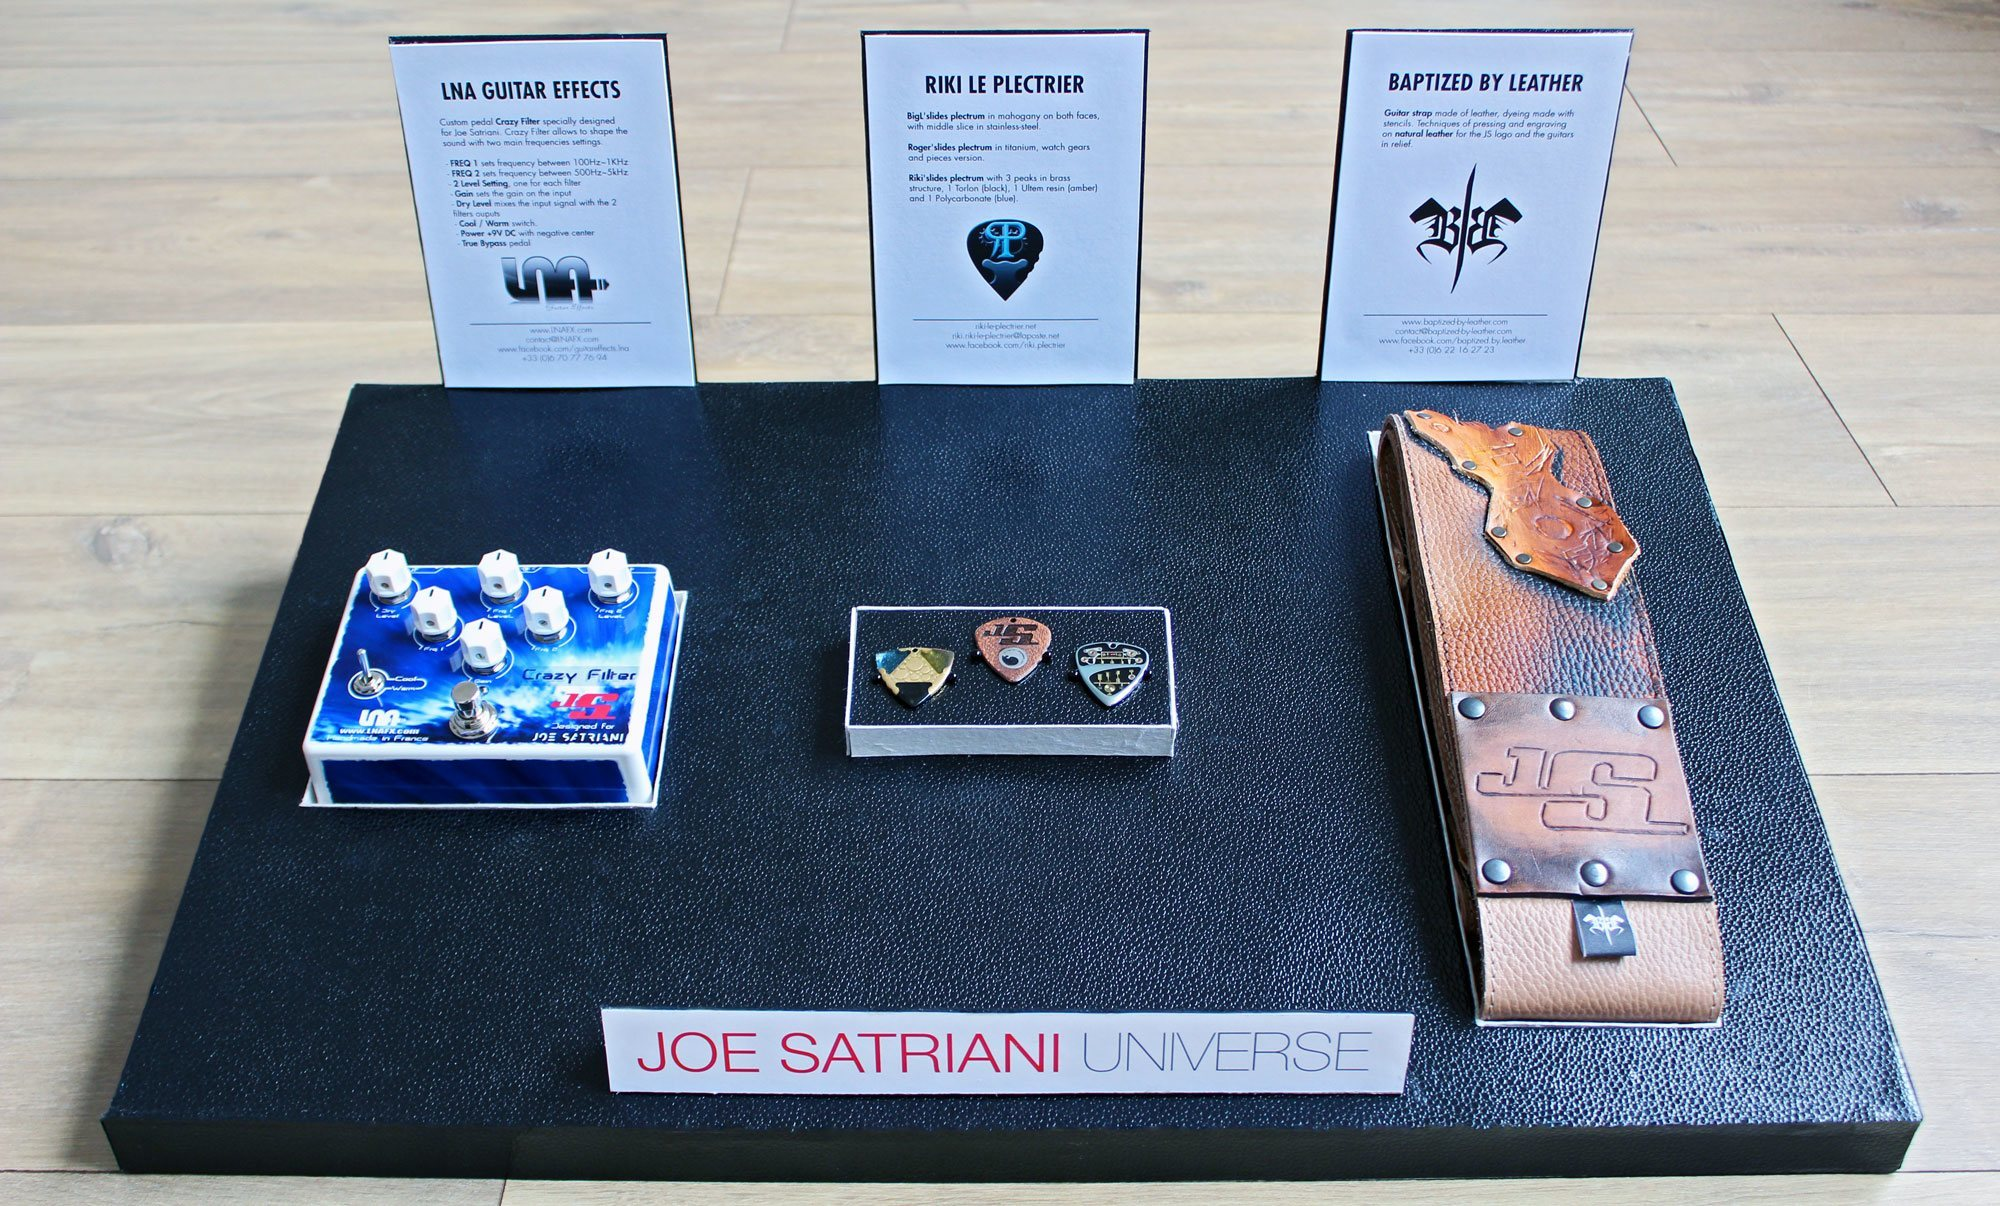 joe satriani universe lna guitar effect riki le plectrier baptized by leather gifts pedal picks strap